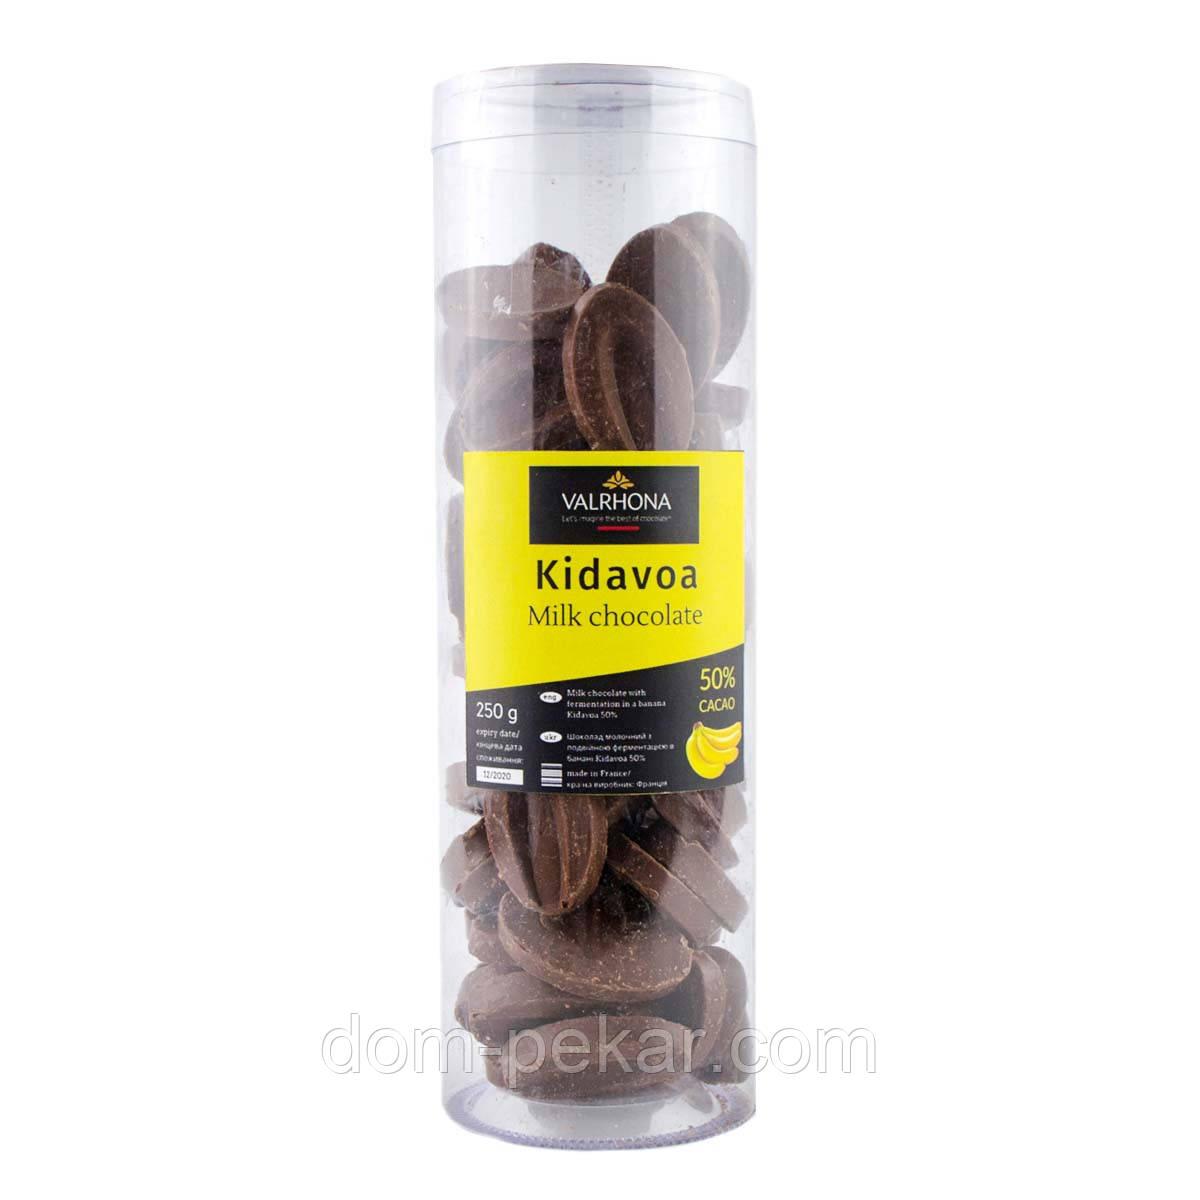 Шоколад Valrhona молочный Kidavoa 50% (тубус) 250 г (ферментация в банане)